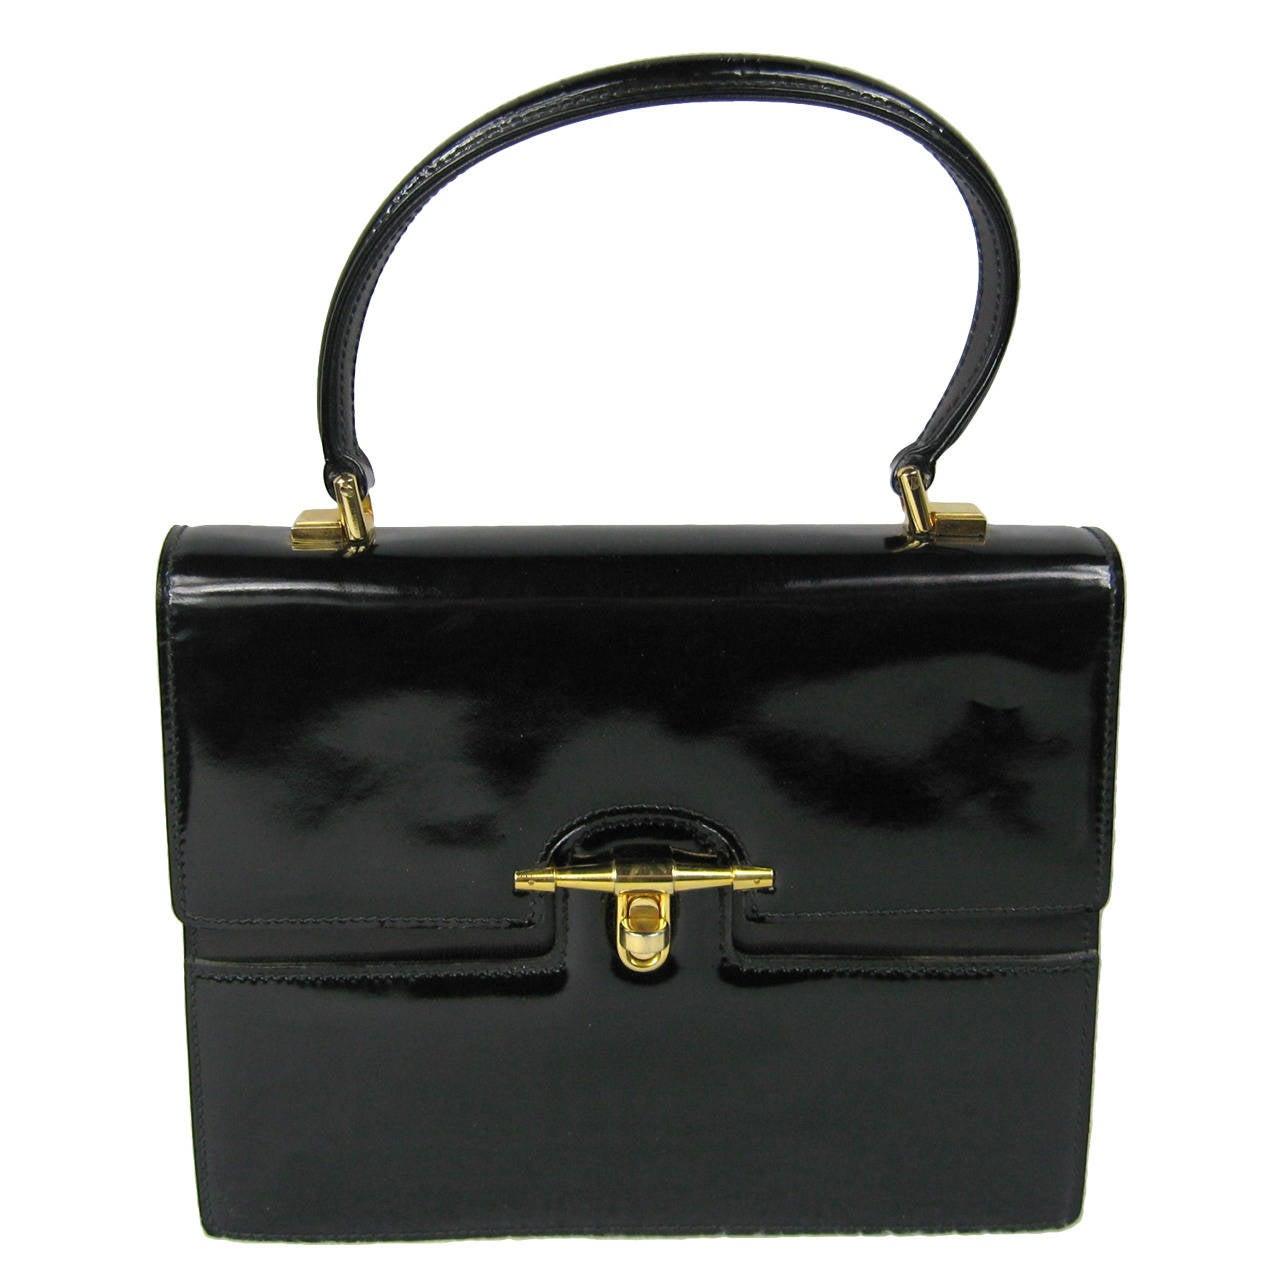 Gucci Vintage Kelly Handbag 1960s New, never used